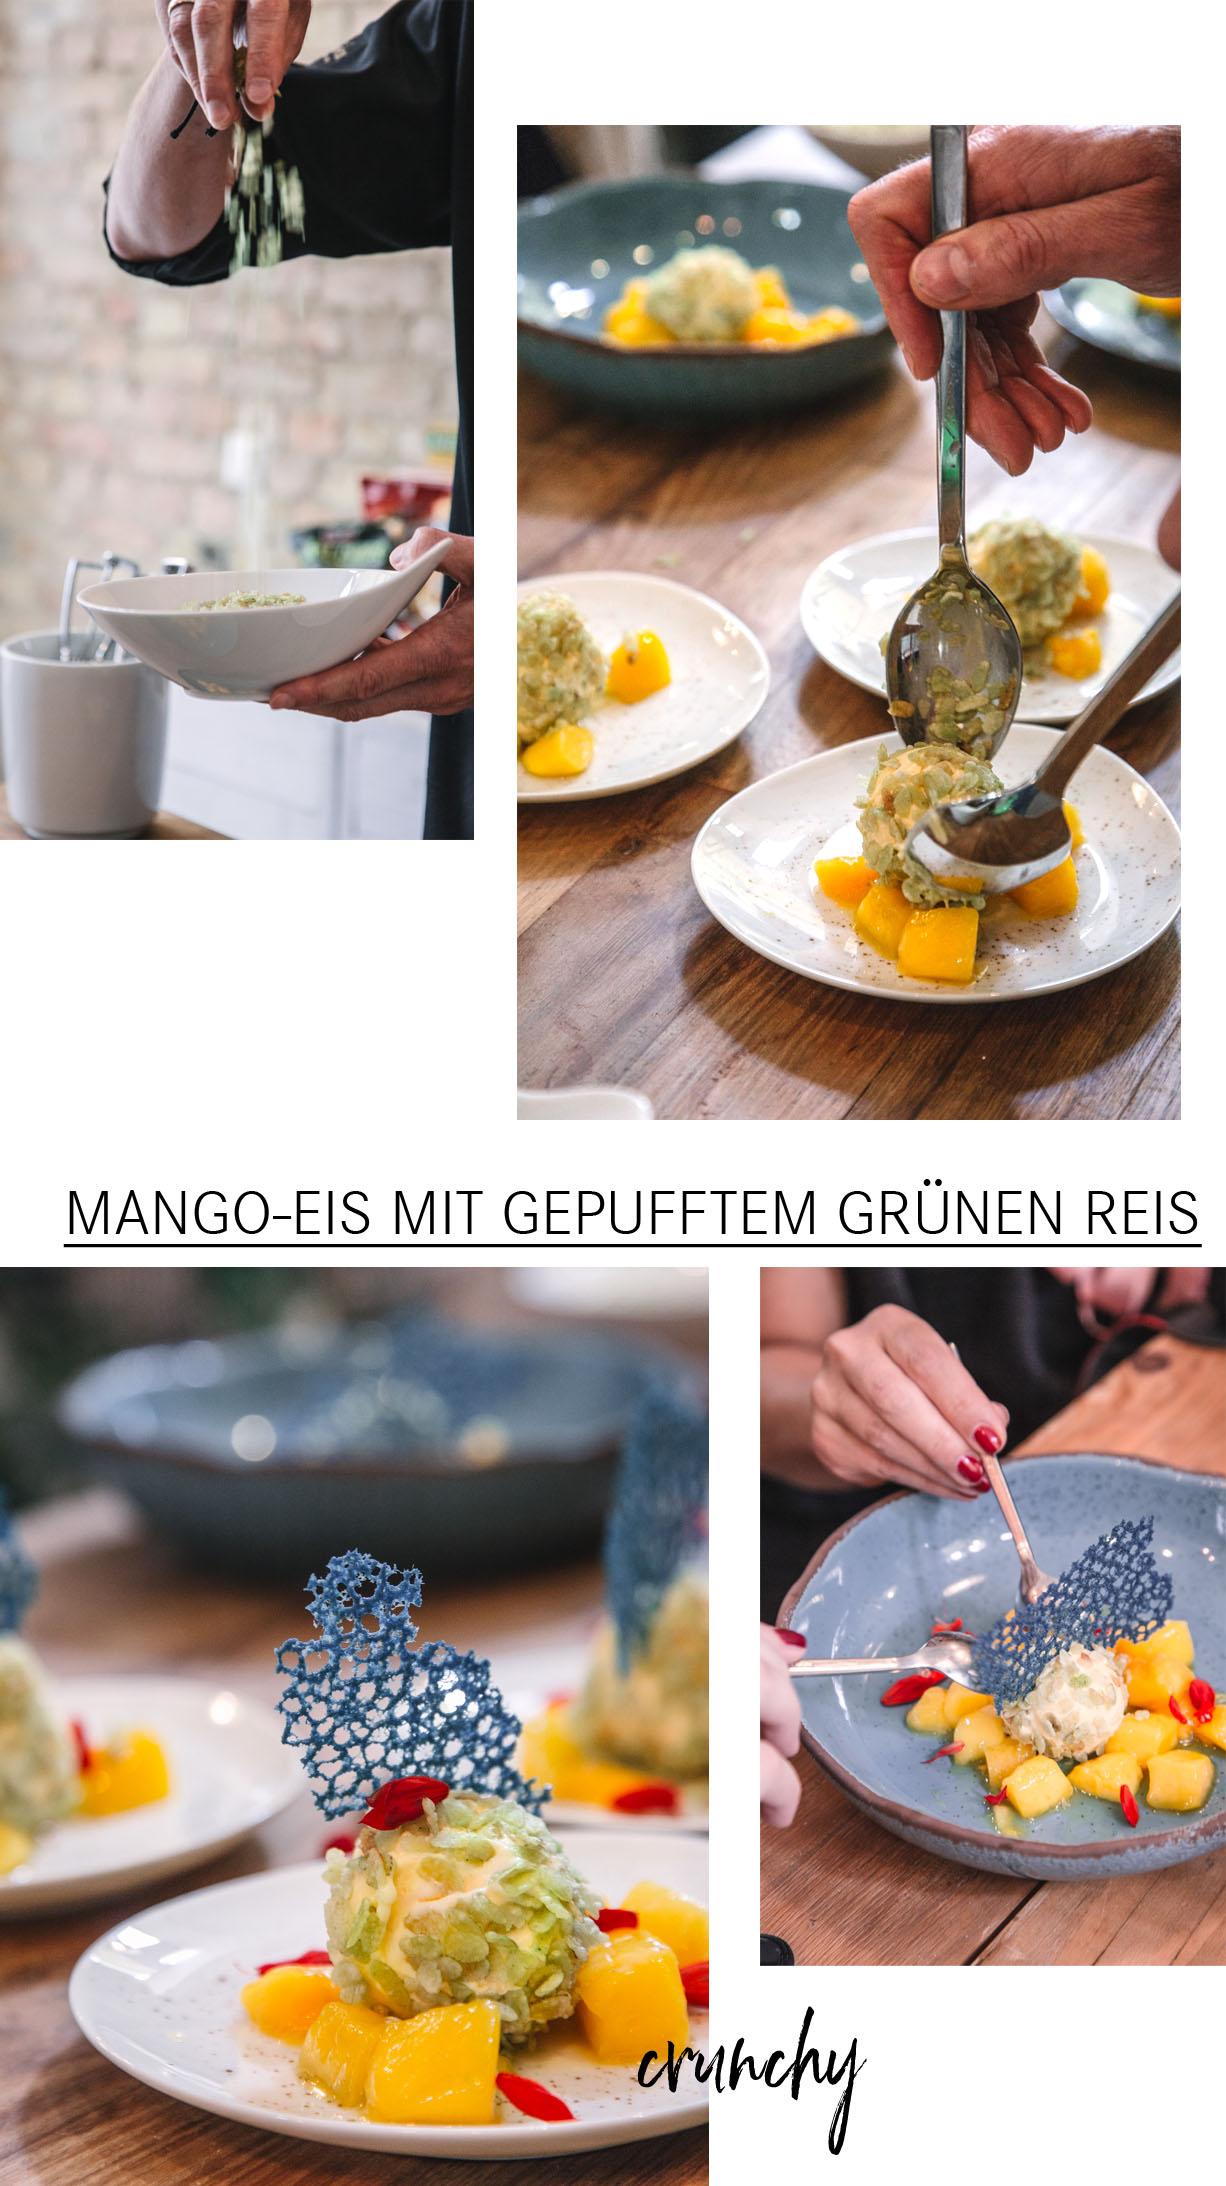 Mango-Eis mit gepufftem grünen Reis